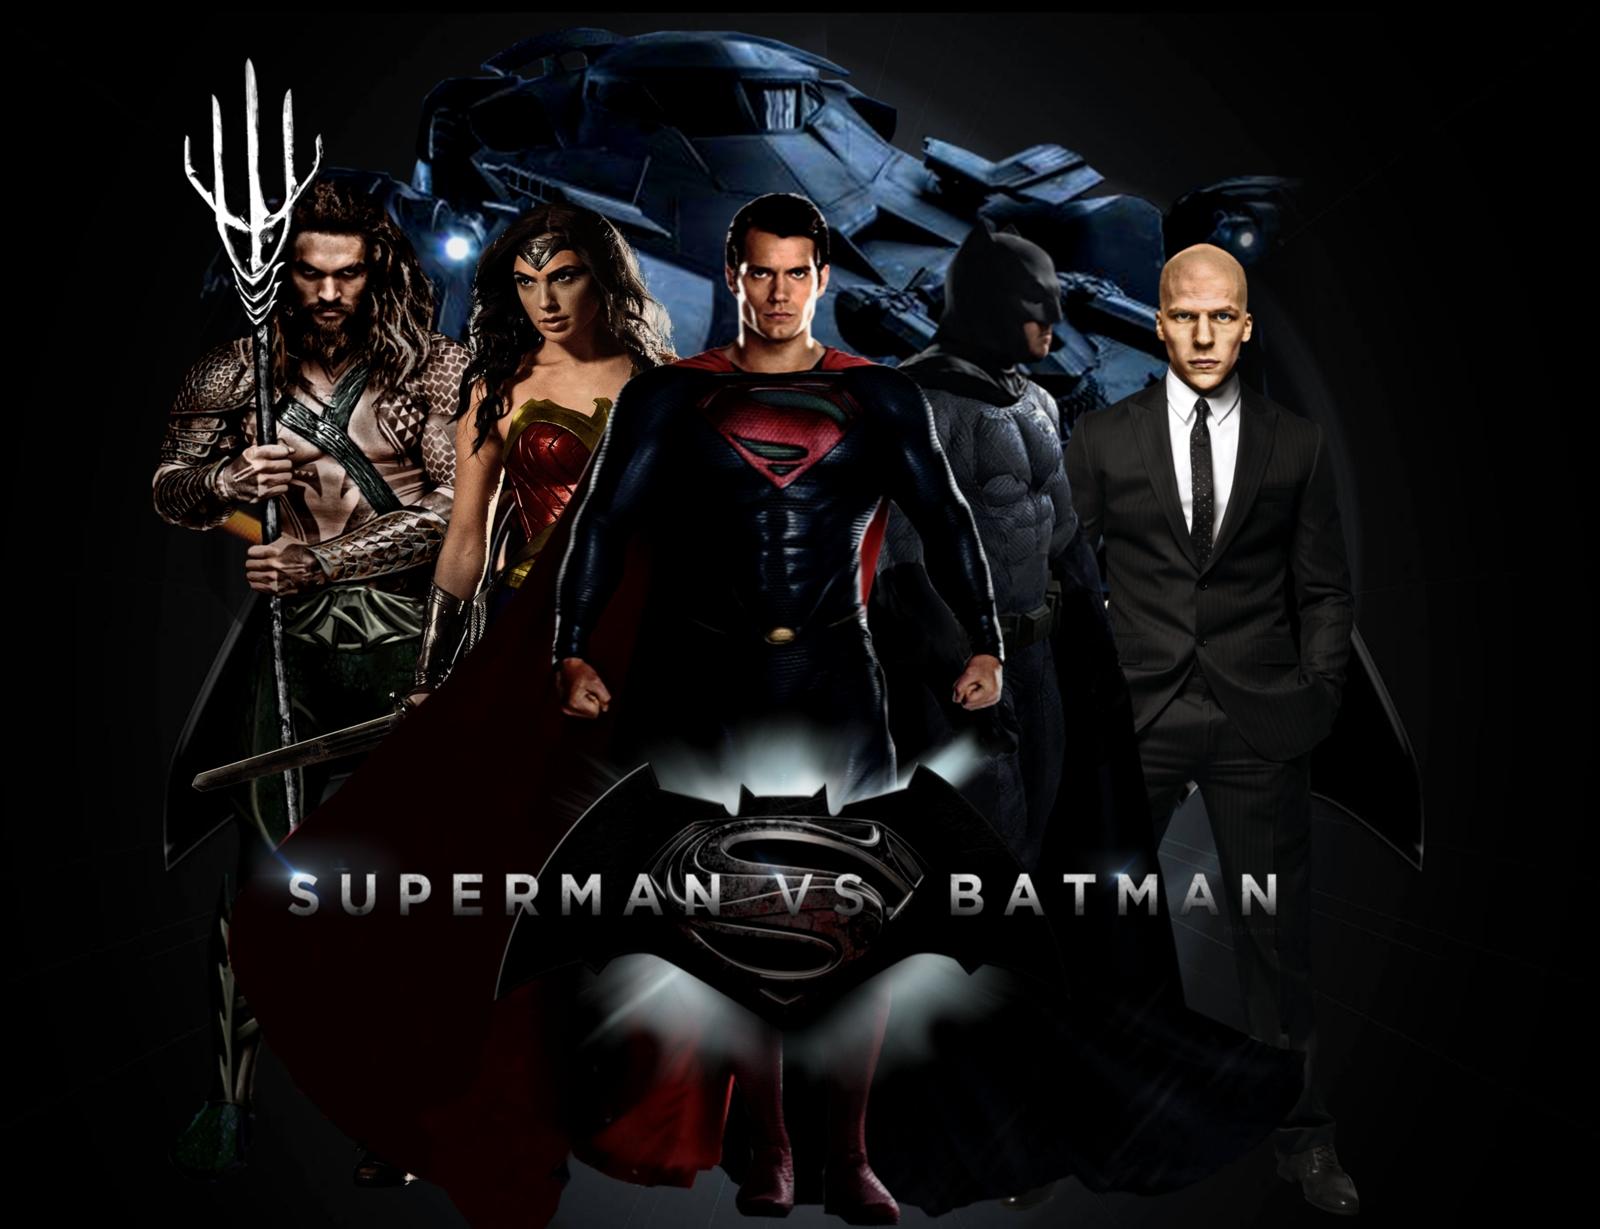 Batman vs Super Man Dawn of Justice 2016 Mujer Maravilla 1600x1229 1600x1229